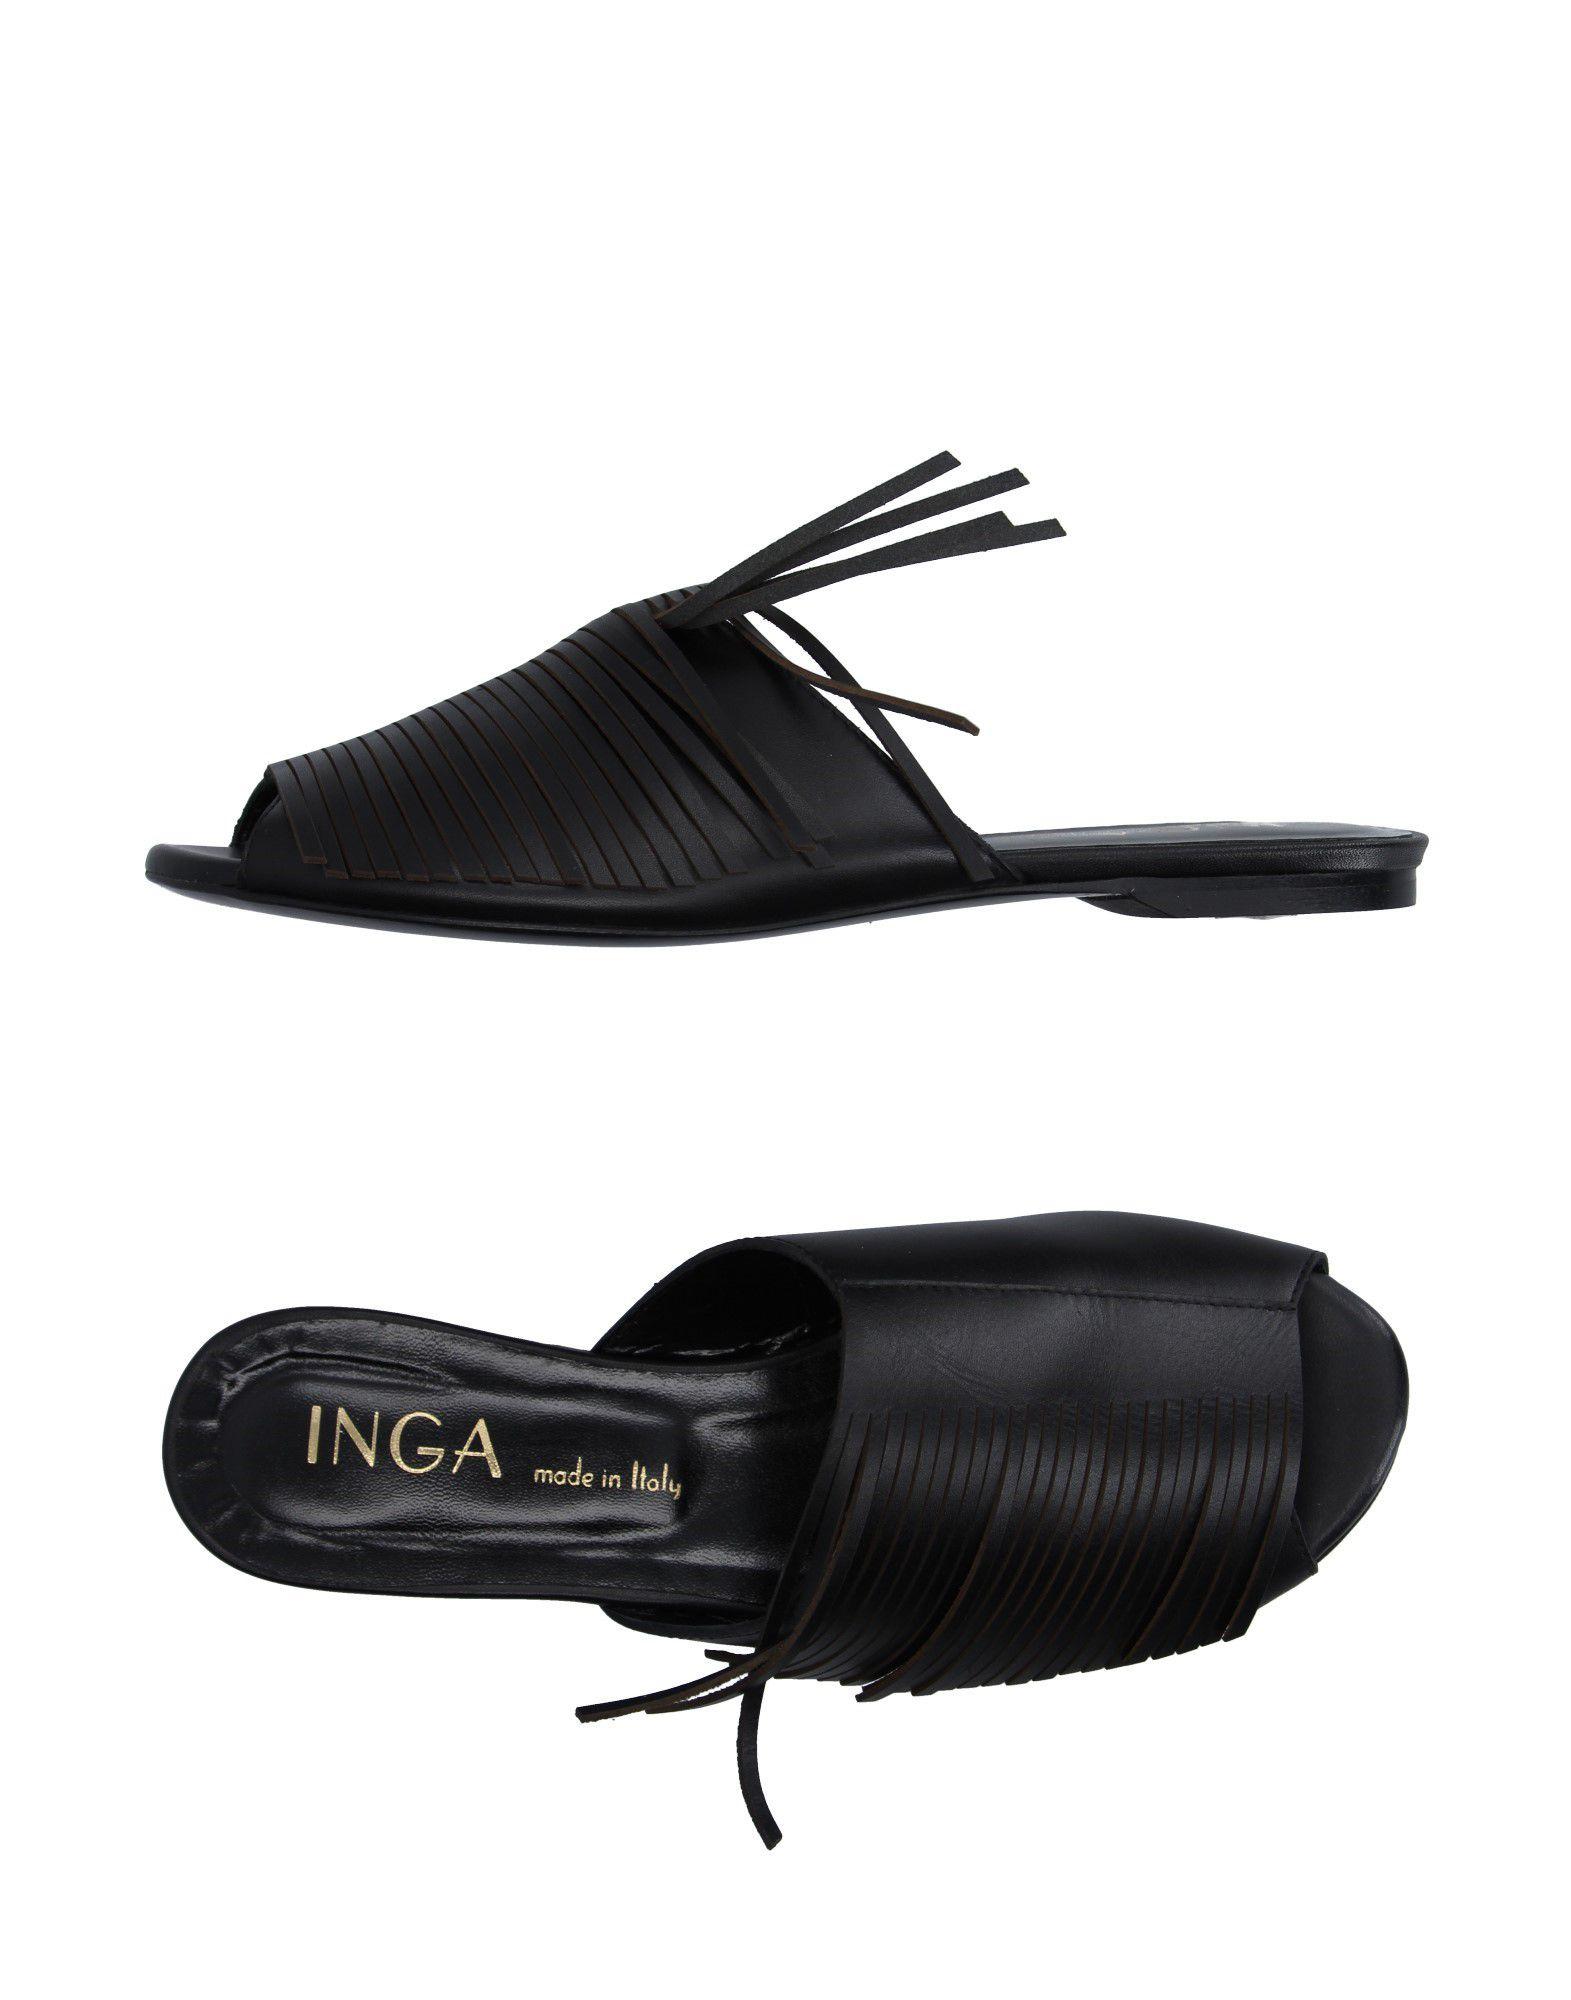 Stilvolle Damen billige Schuhe Inga Sandalen Damen Stilvolle  11143957GI fd0bd1